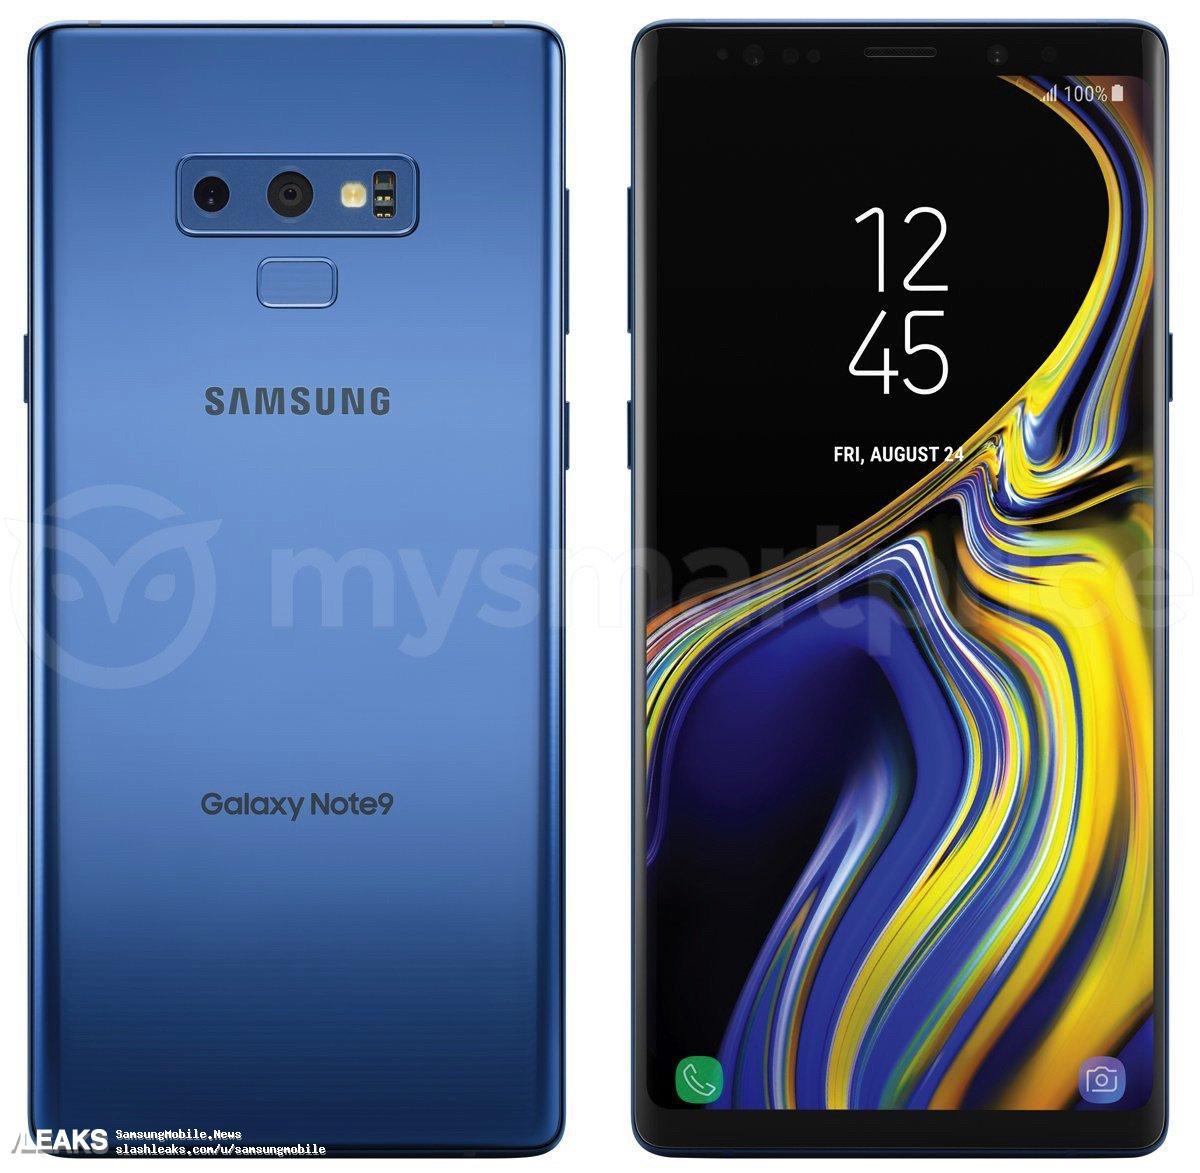 img Galaxy Note9 press render leaked in blue